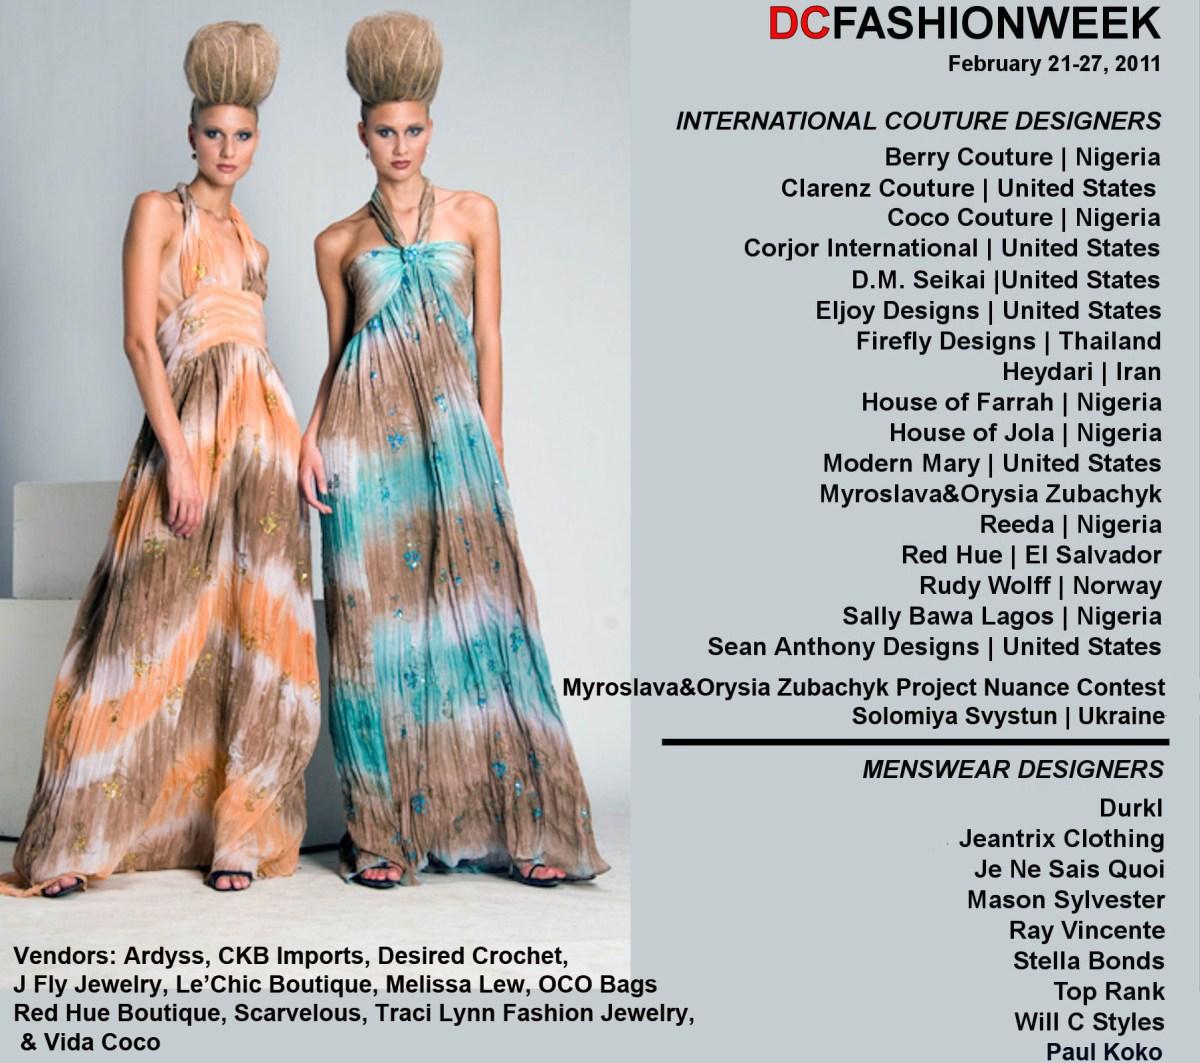 Fashionable Life: DC Fashion Week 2011 Event List | Washington Life